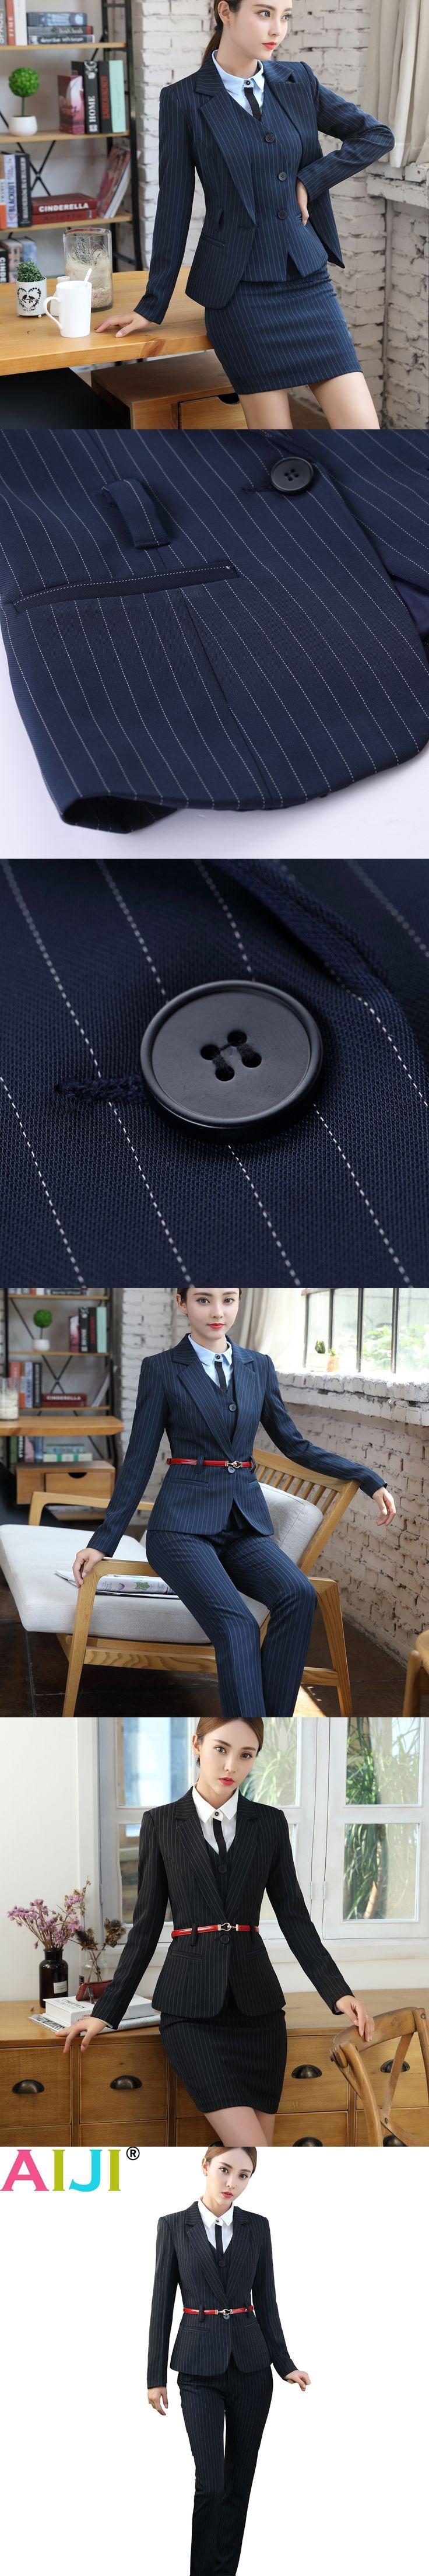 Women sashes work trouser suit business fashion formal long sleeve stripe navy blazer pants set office ladies plus size suits